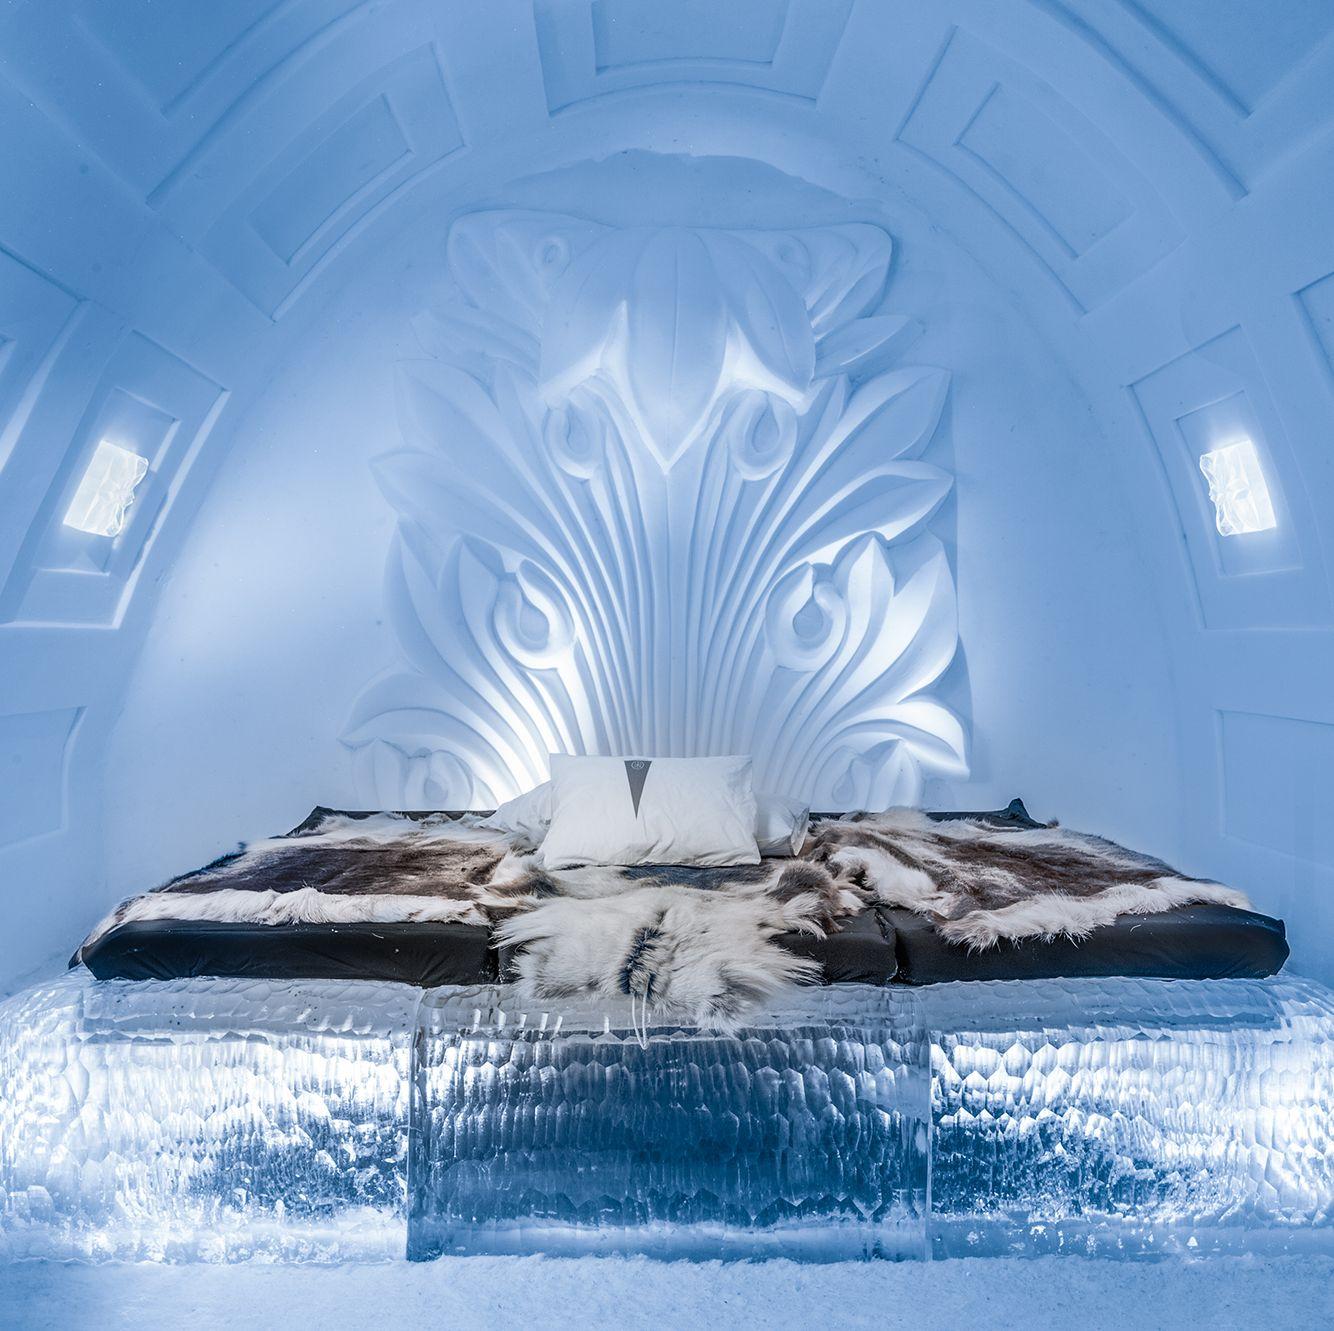 2020 holidays: Icehotel Sweden